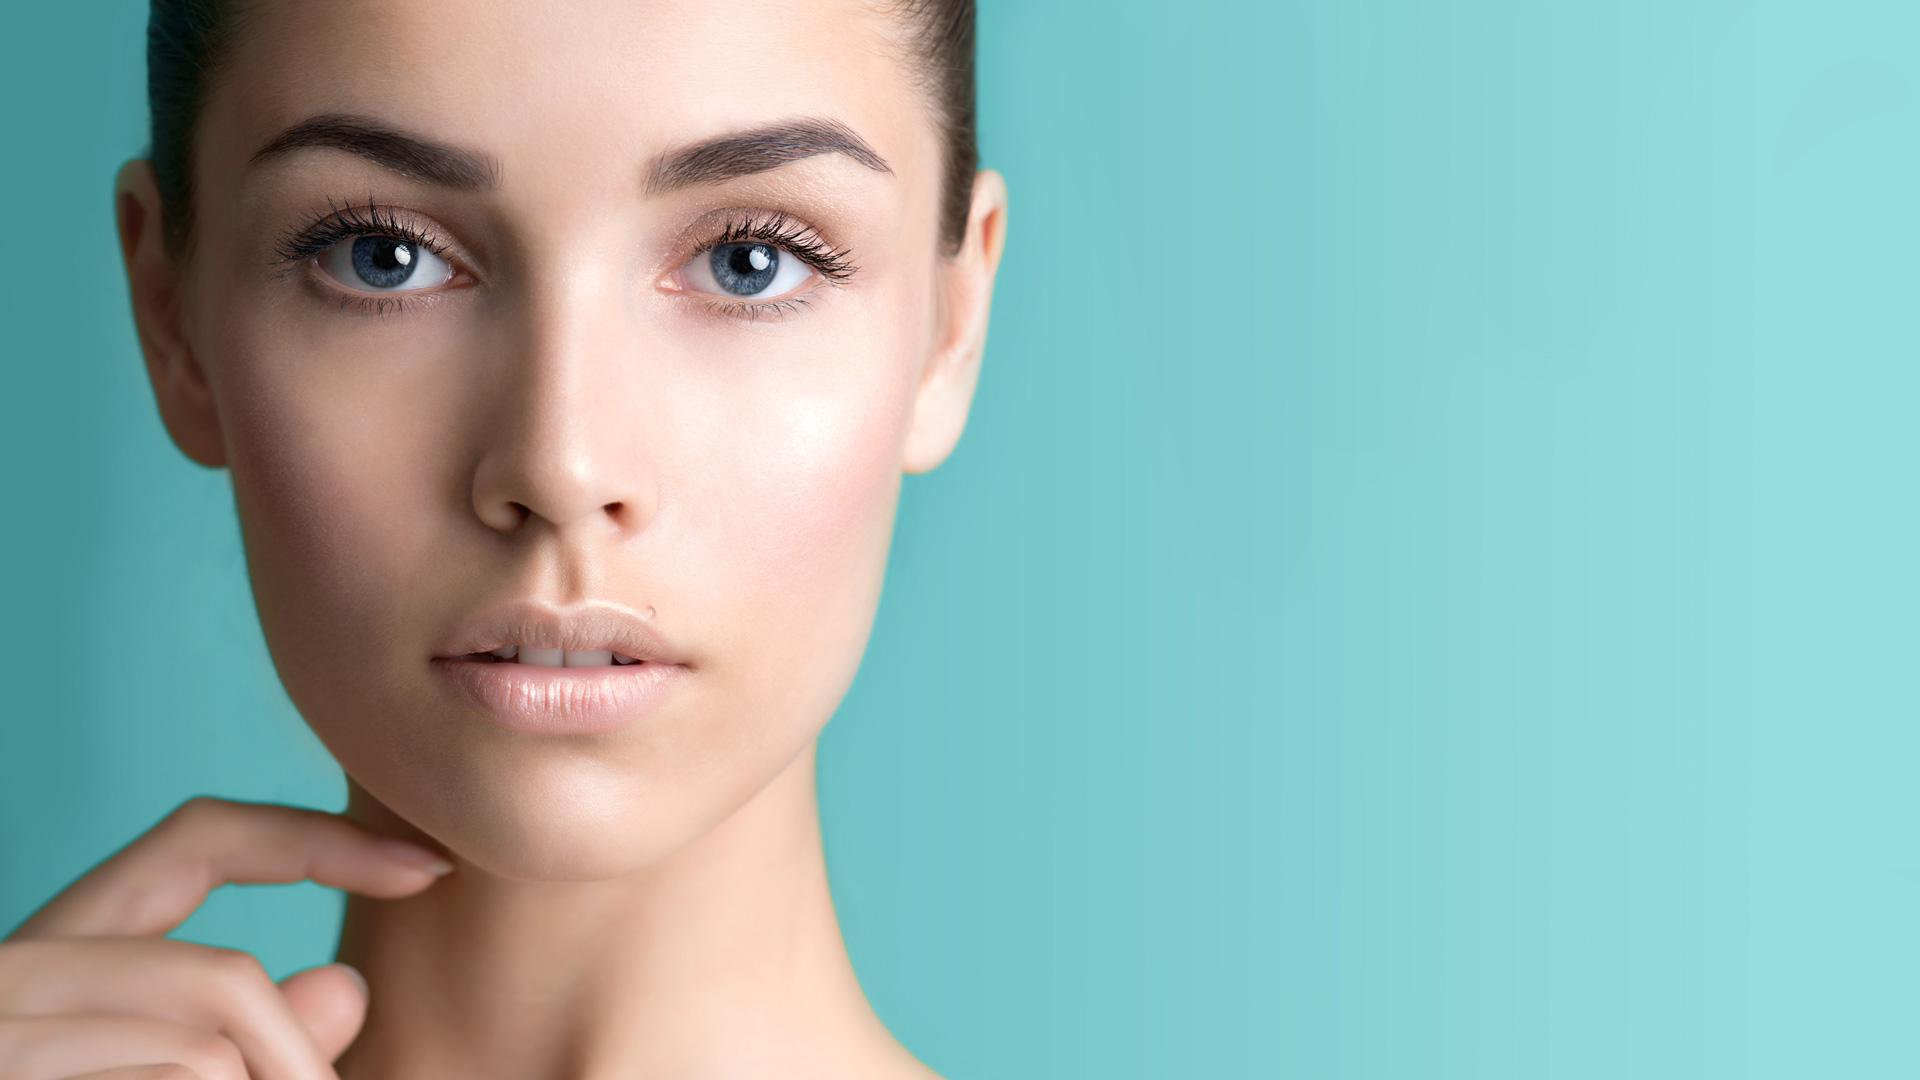 What Makes Aloe Vera Gel so Popular Among Dermatologists?